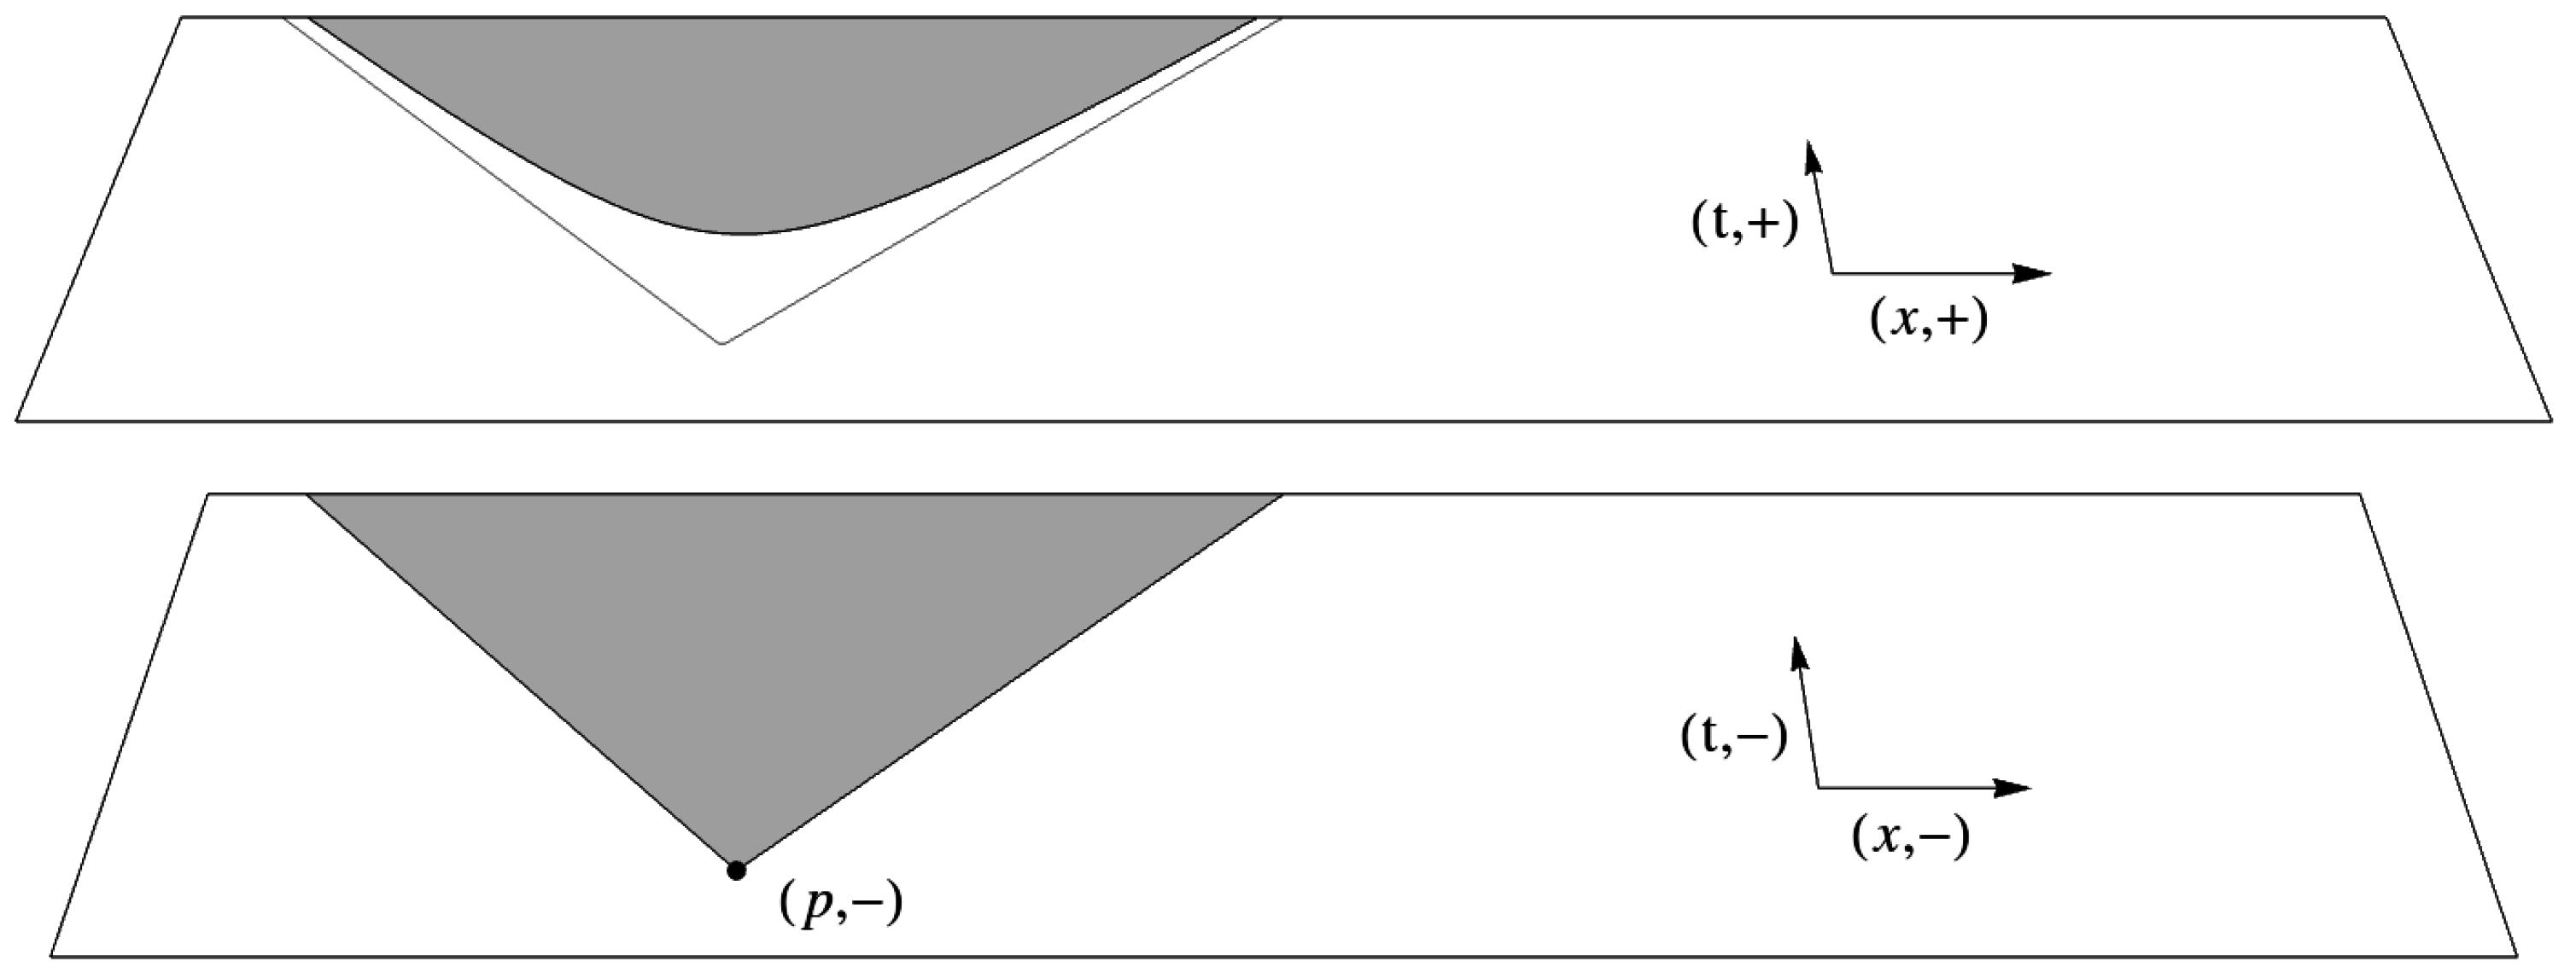 Dyson equation that